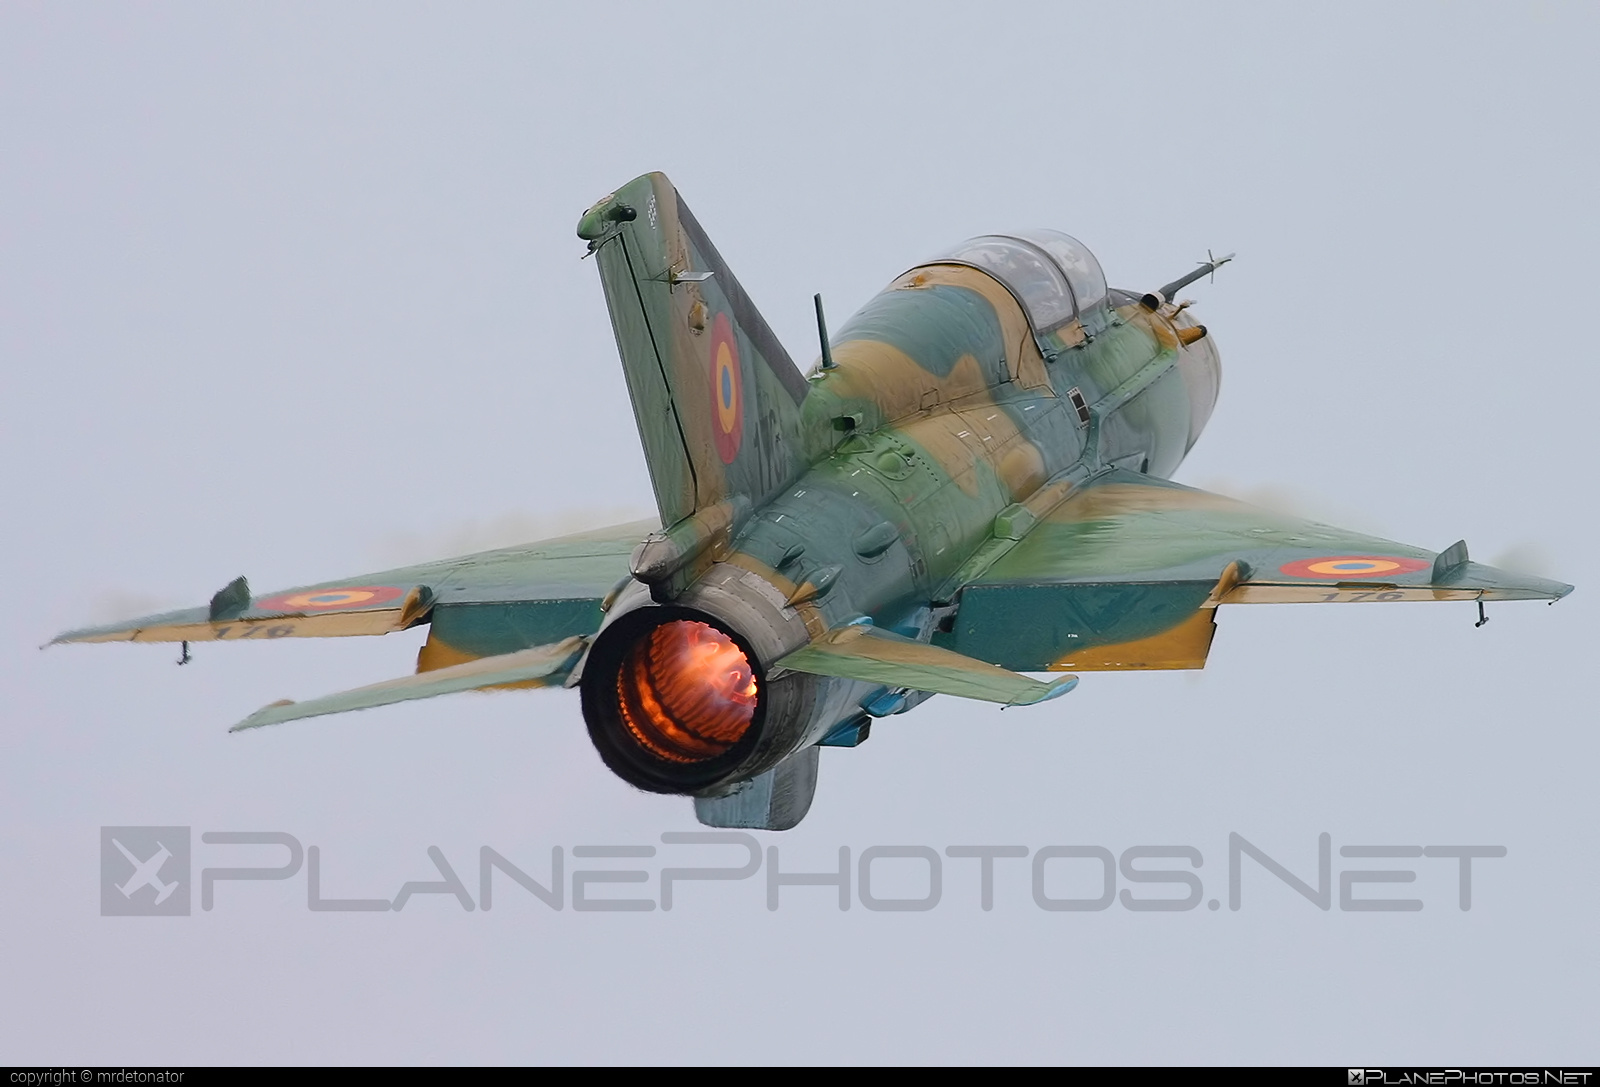 Mikoyan-Gurevich MiG-21UM - 176 operated by Forţele Aeriene Române (Romanian Air Force) #forteleaerieneromane #mig #mig21 #mig21um #mikoyangurevich #romanianairforce